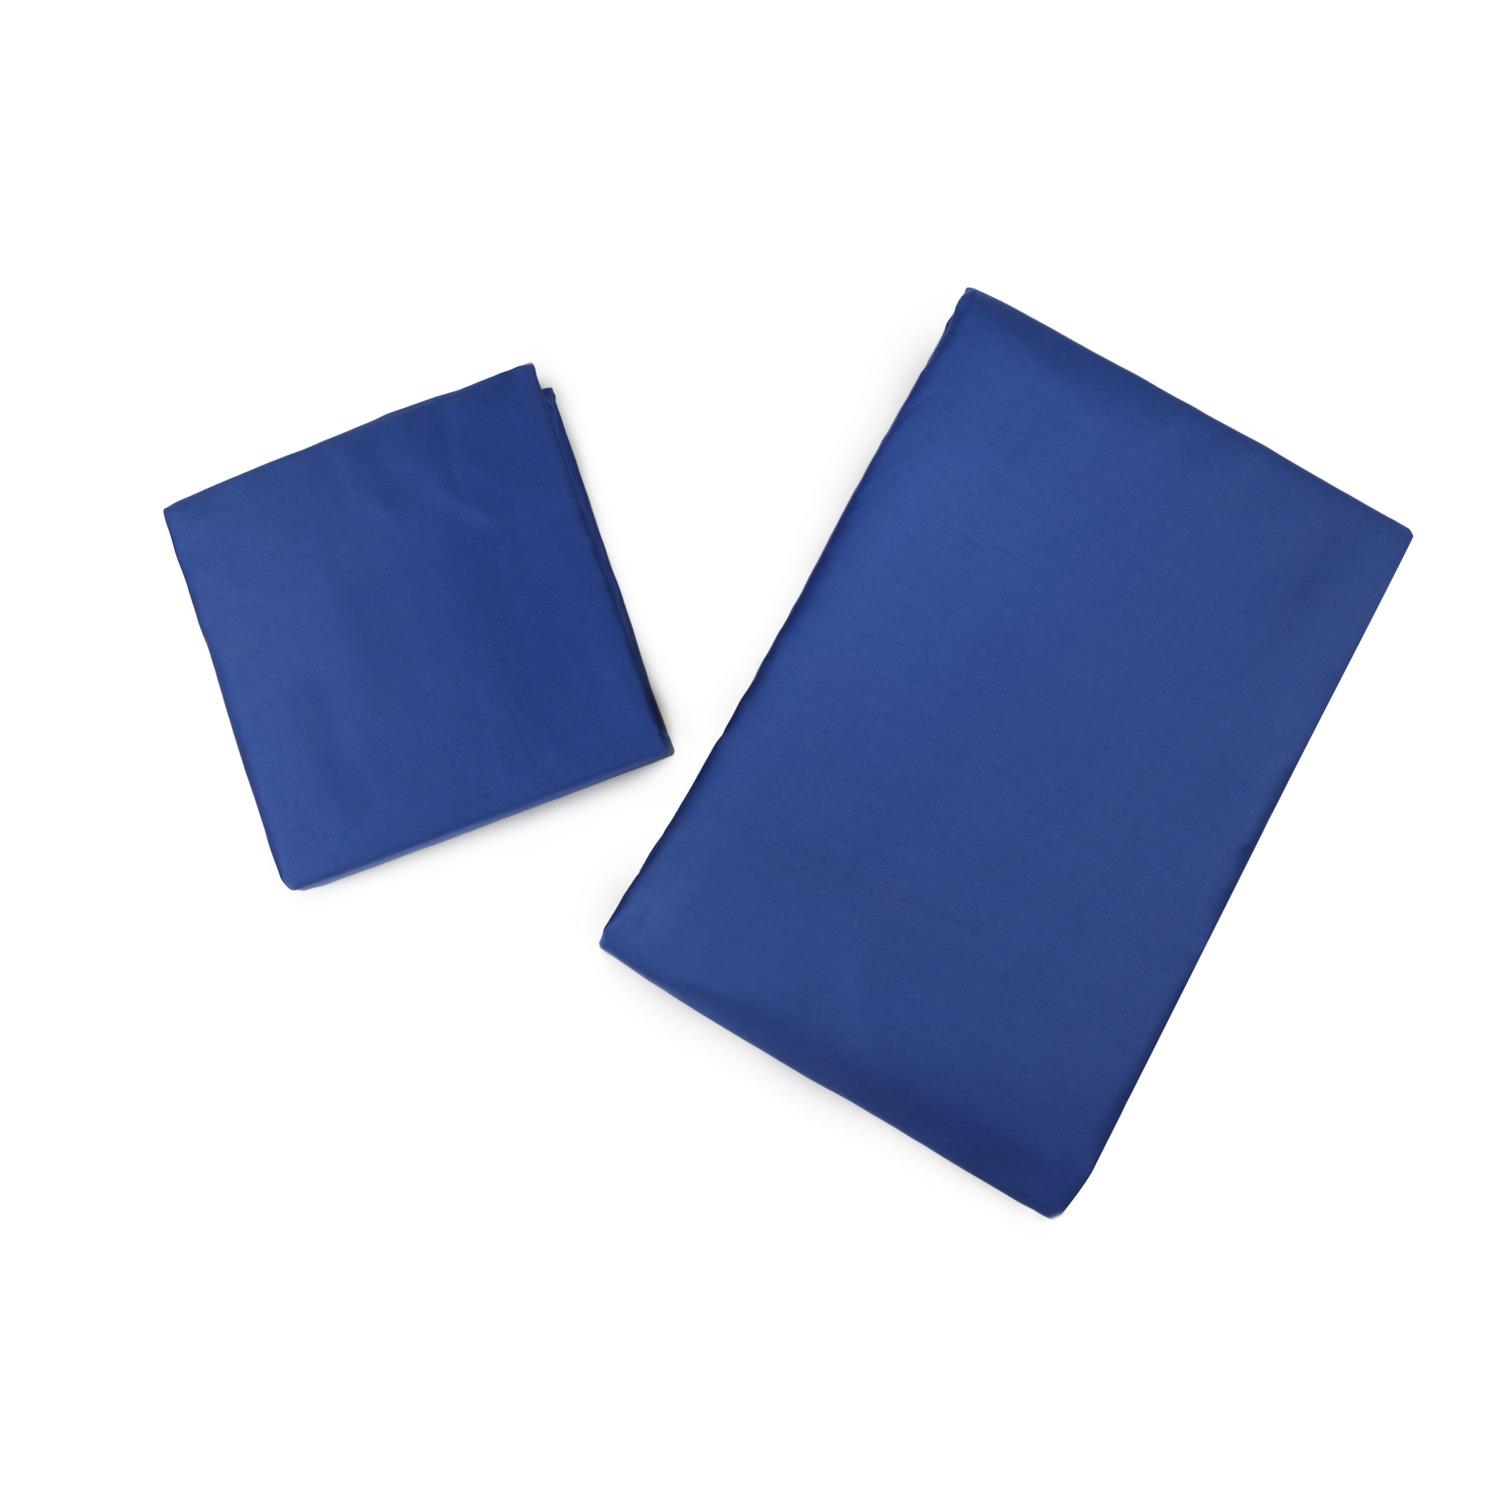 Doppel-Bettbezug-Set De Dark Blue I Dunkelblau - 200x200cm